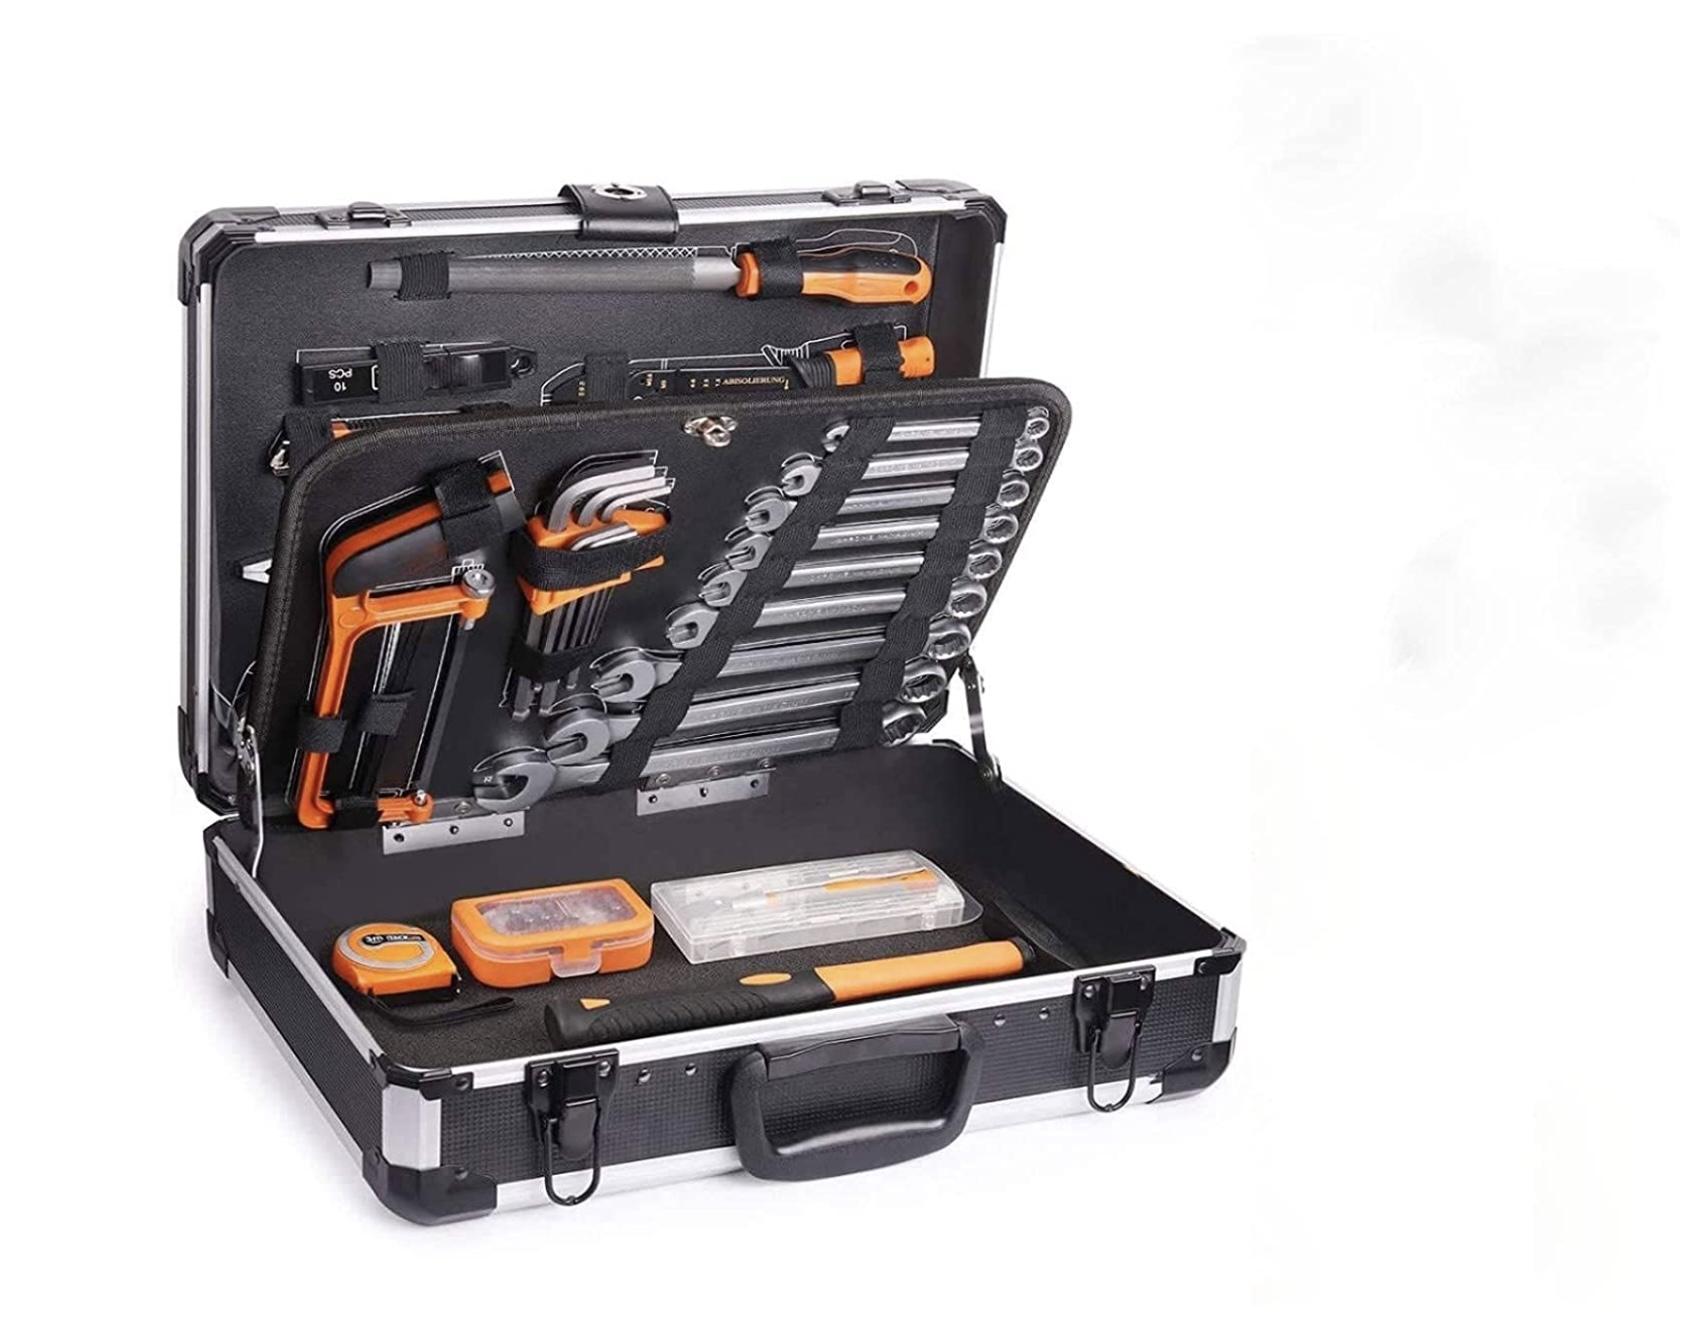 Caja de Herramientas de Aluminio 136Pcs